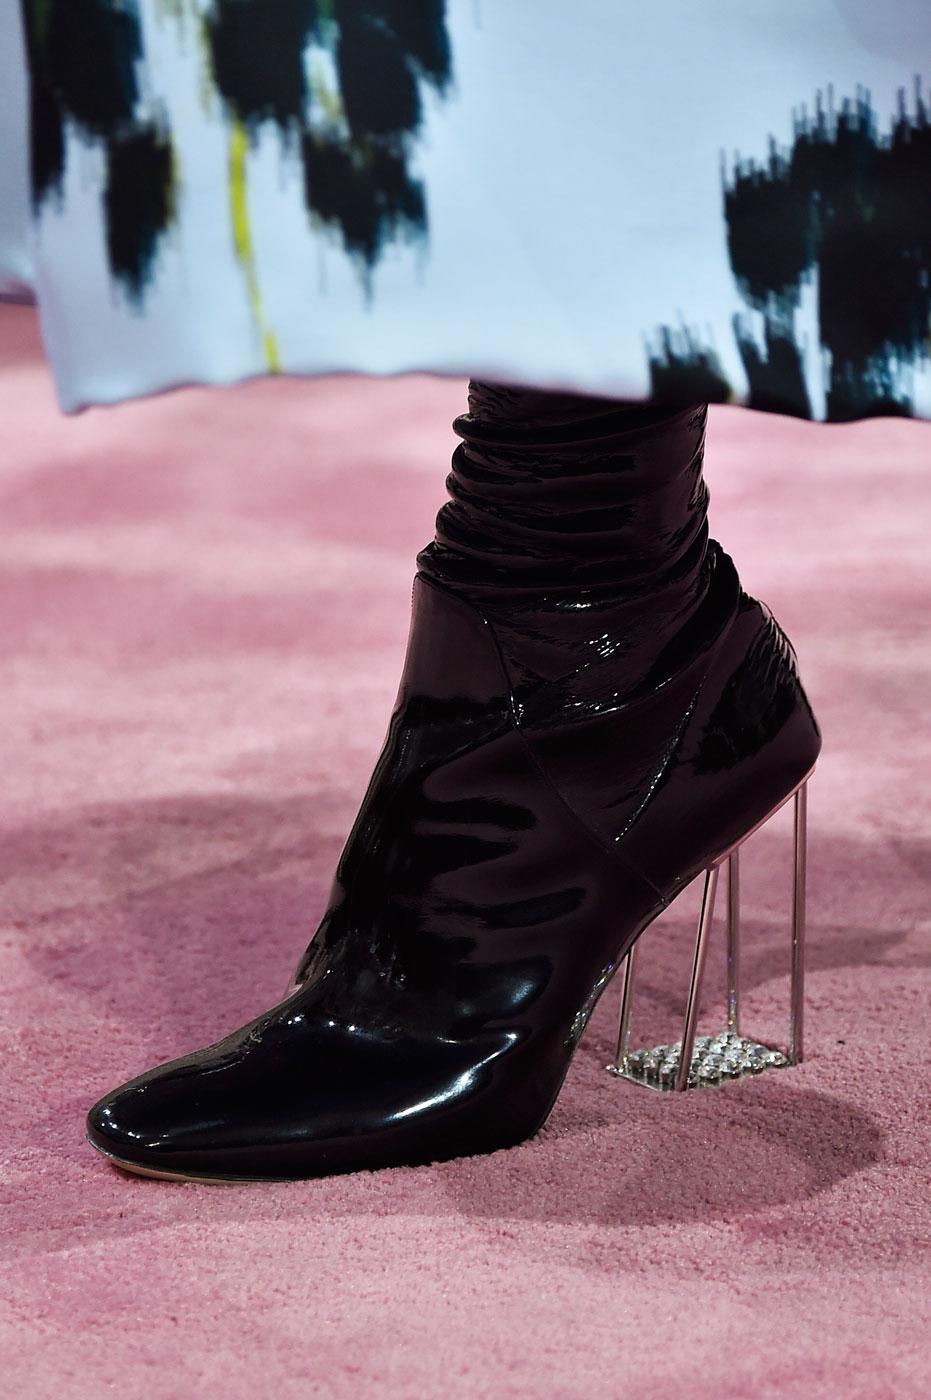 Christian-Dior-fashion-runway-show-close-ups-haute-couture-paris-spring-summer-2015-the-impression-158